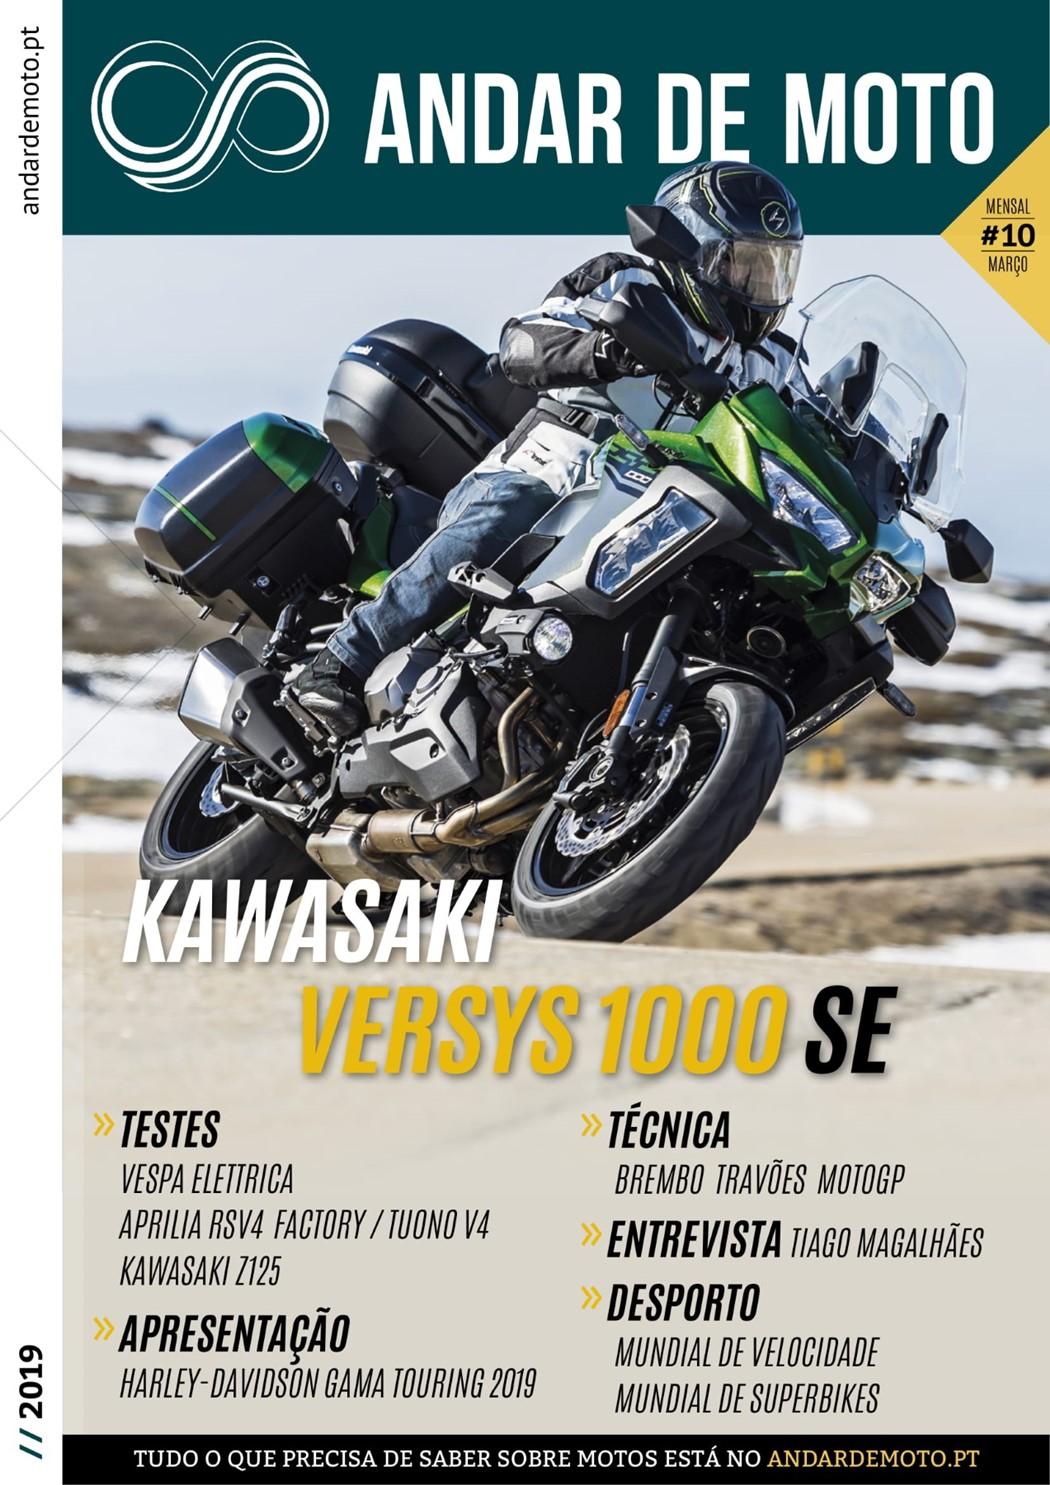 [Revista digital] Andar de Moto Rnvyyzkui45yme52wspurex3zu2